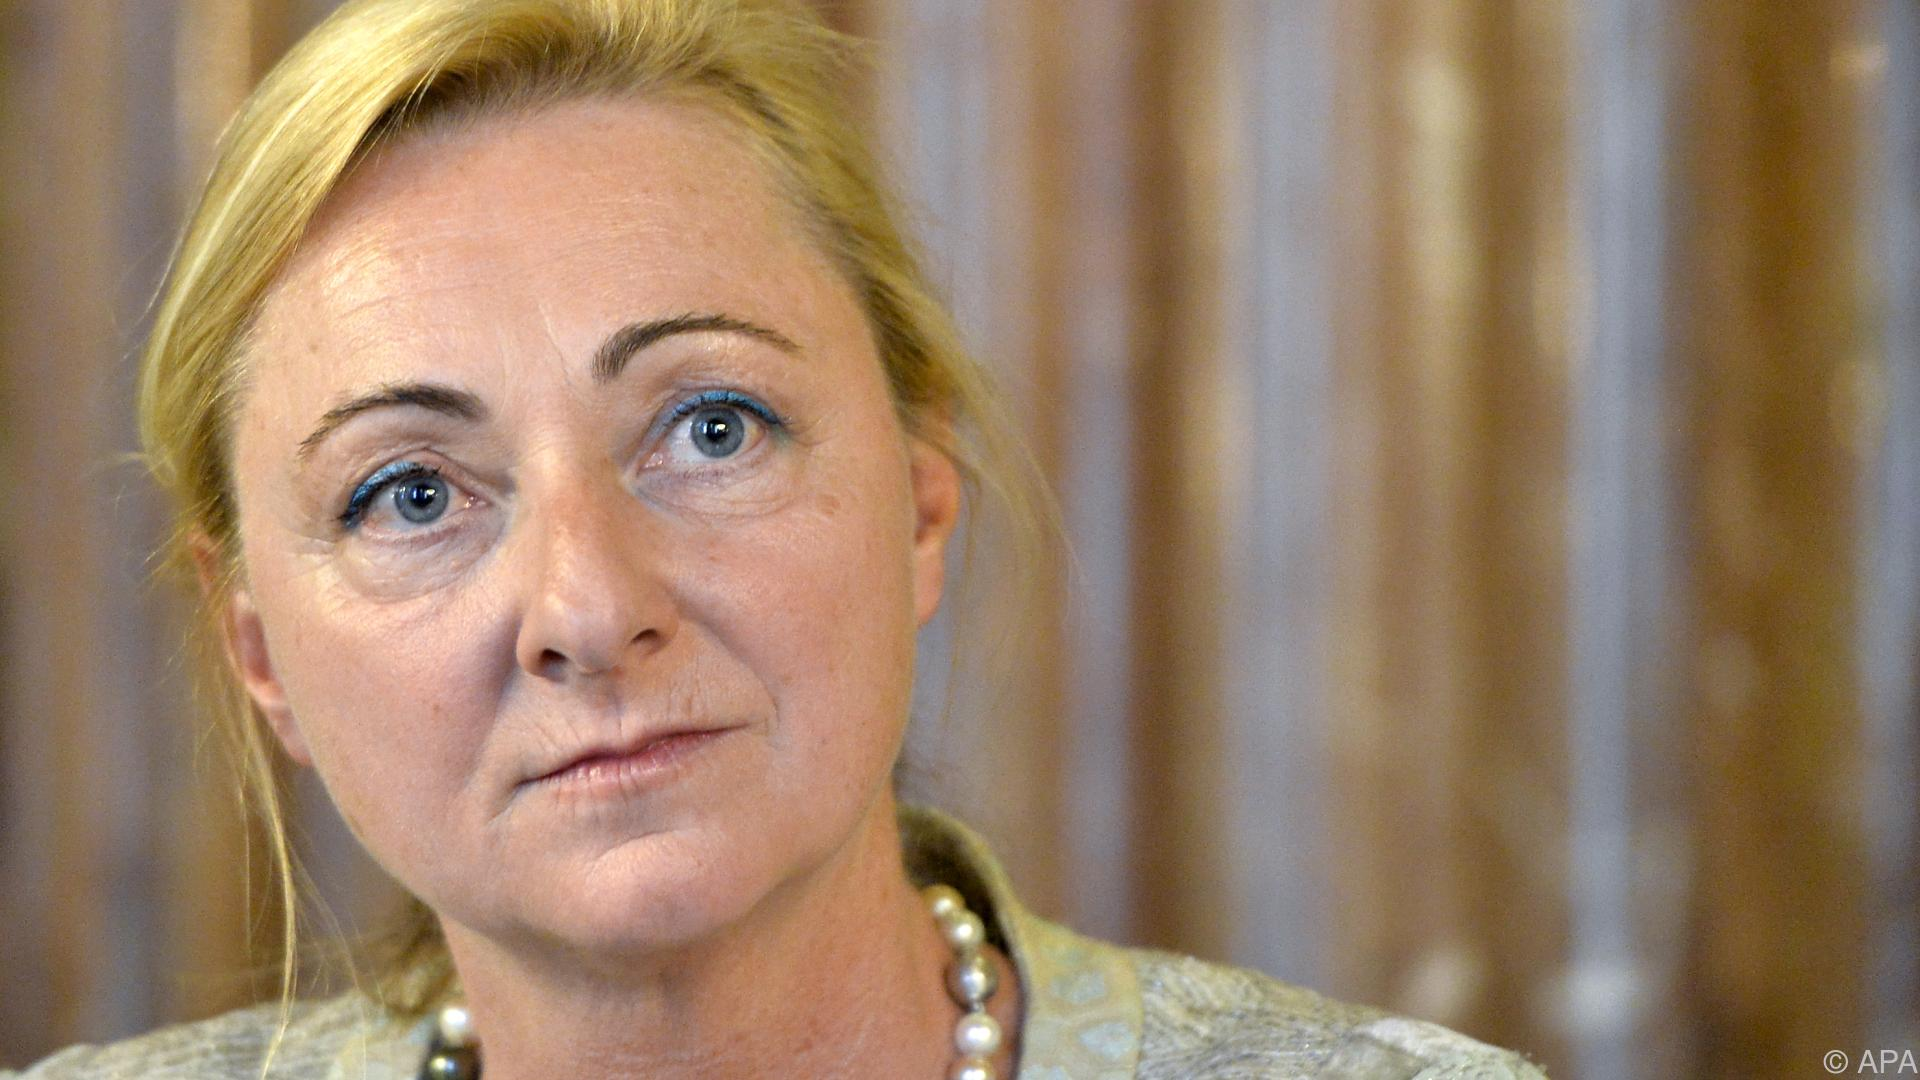 Barbara Kolm spendete 18.000 Euro an die EU-Fraktion ACRE